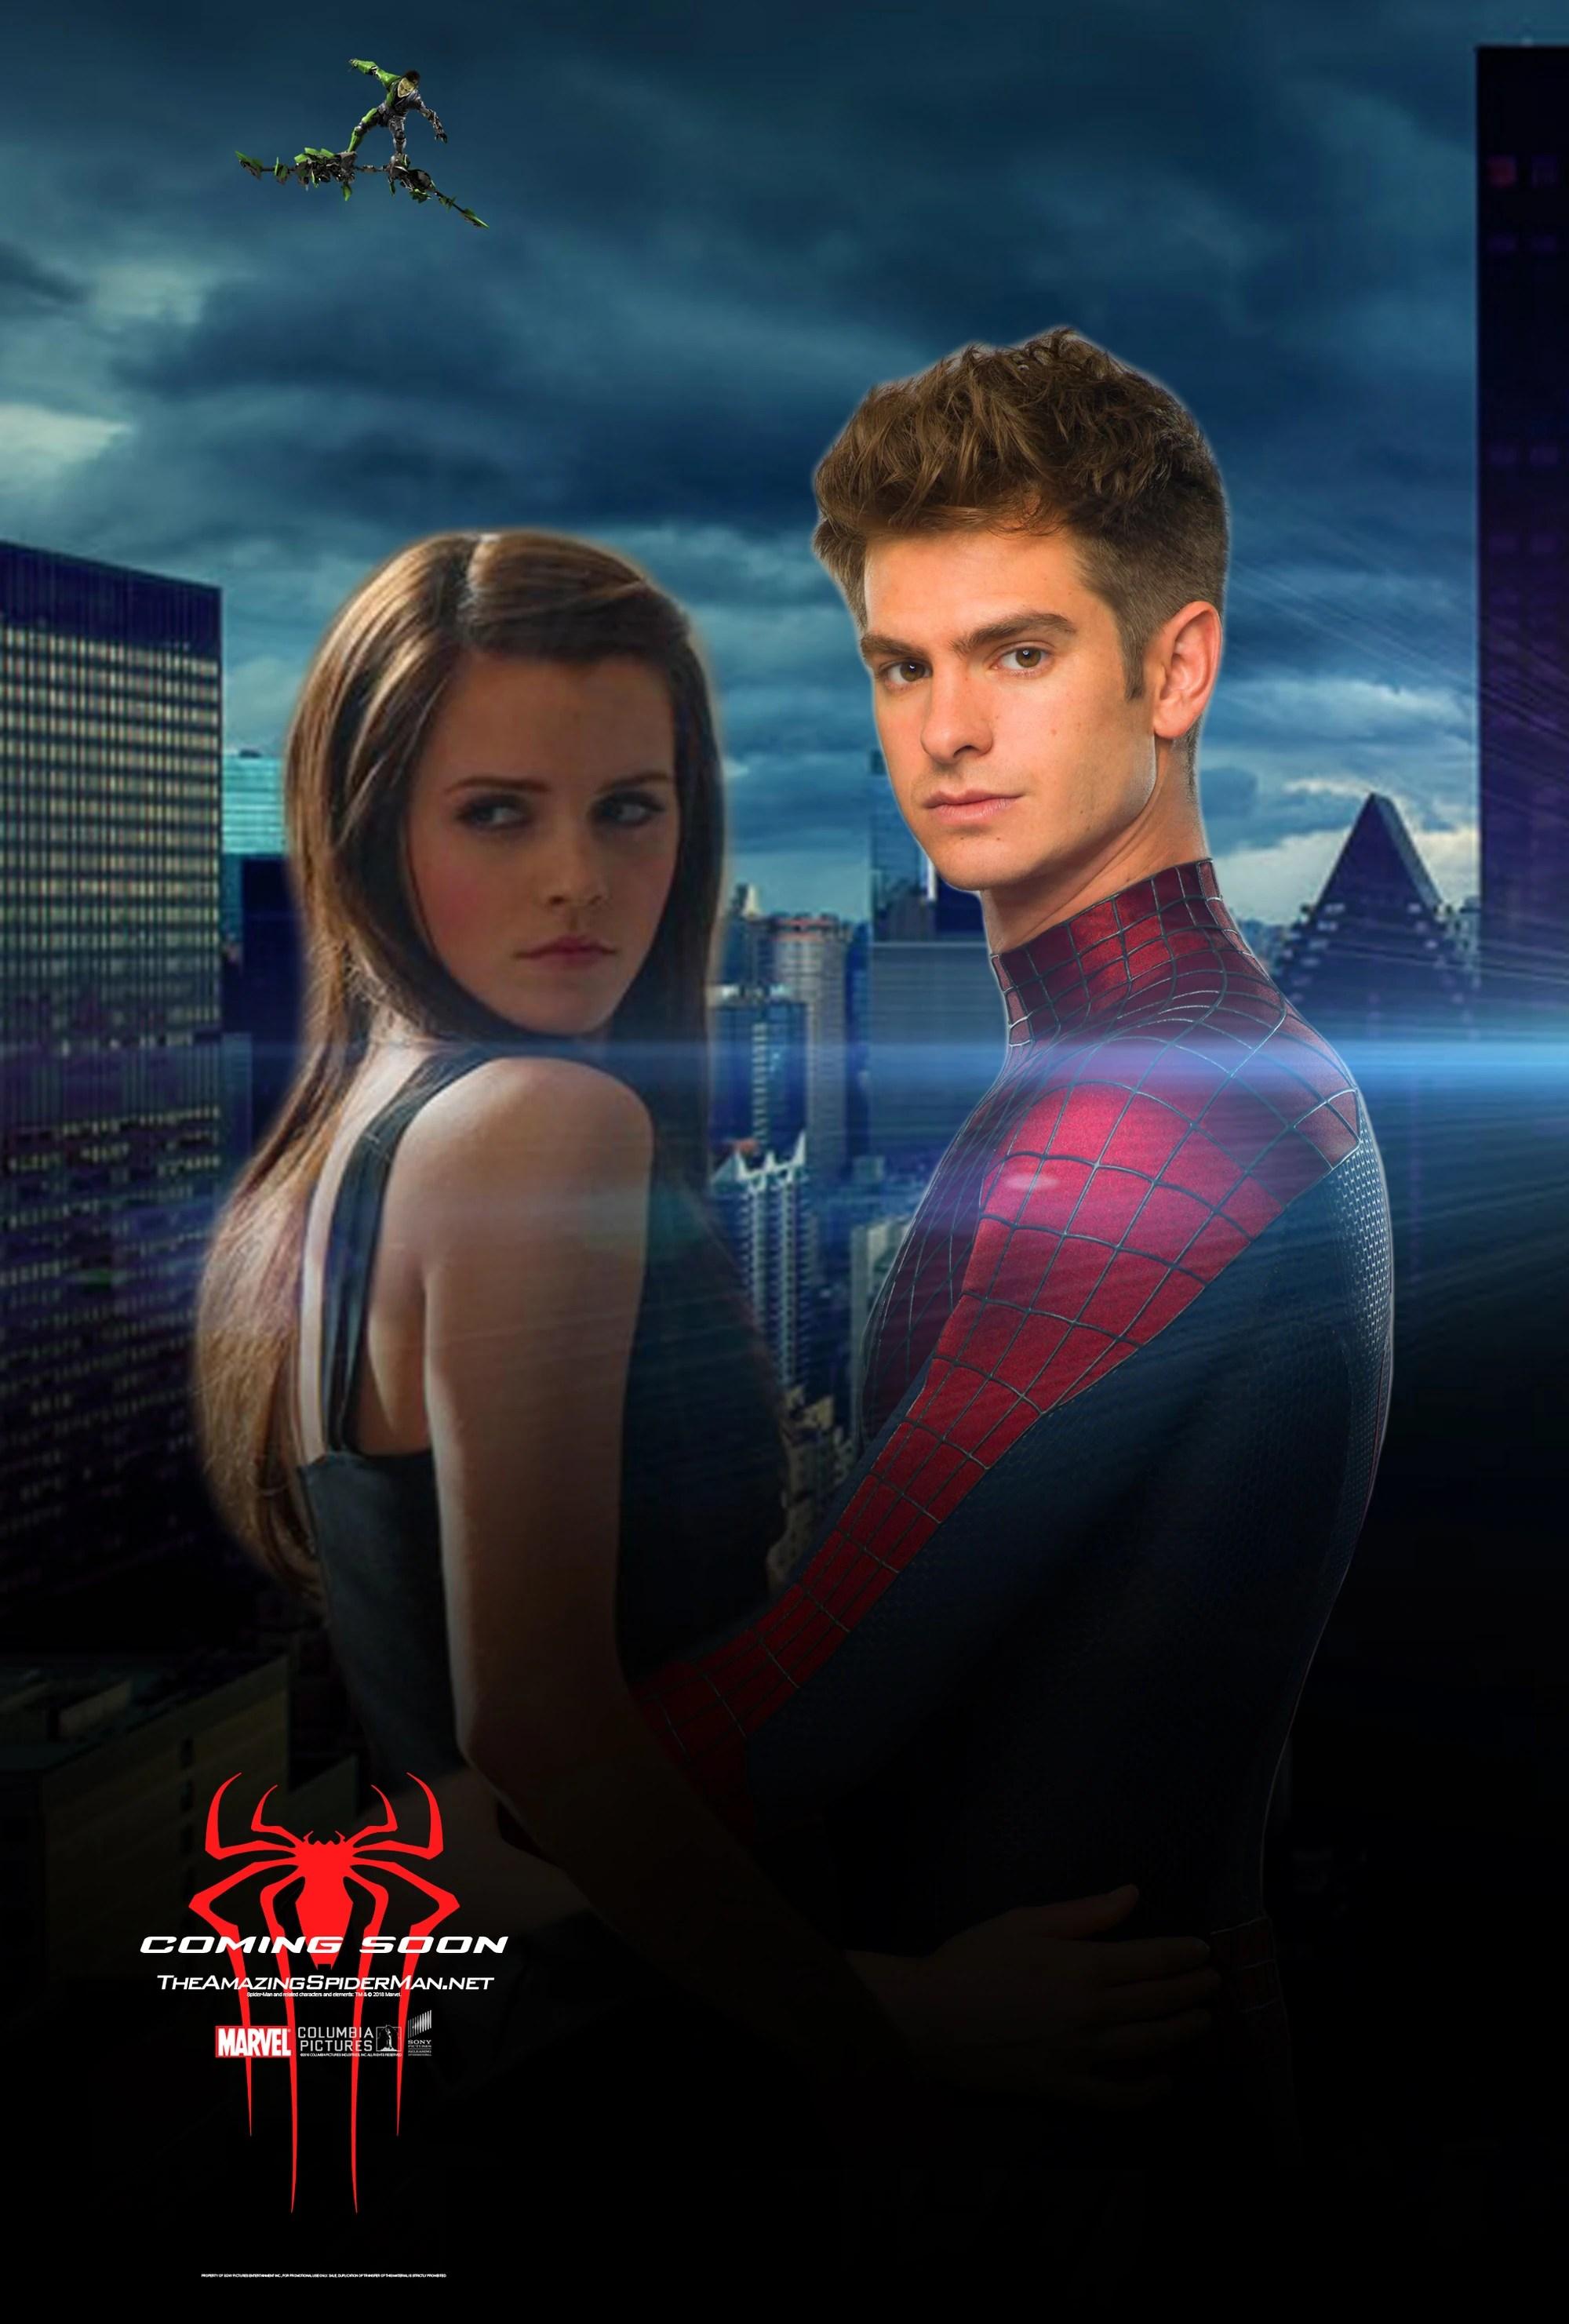 Spiderman Students Wiki Fandom - Year of Clean Water